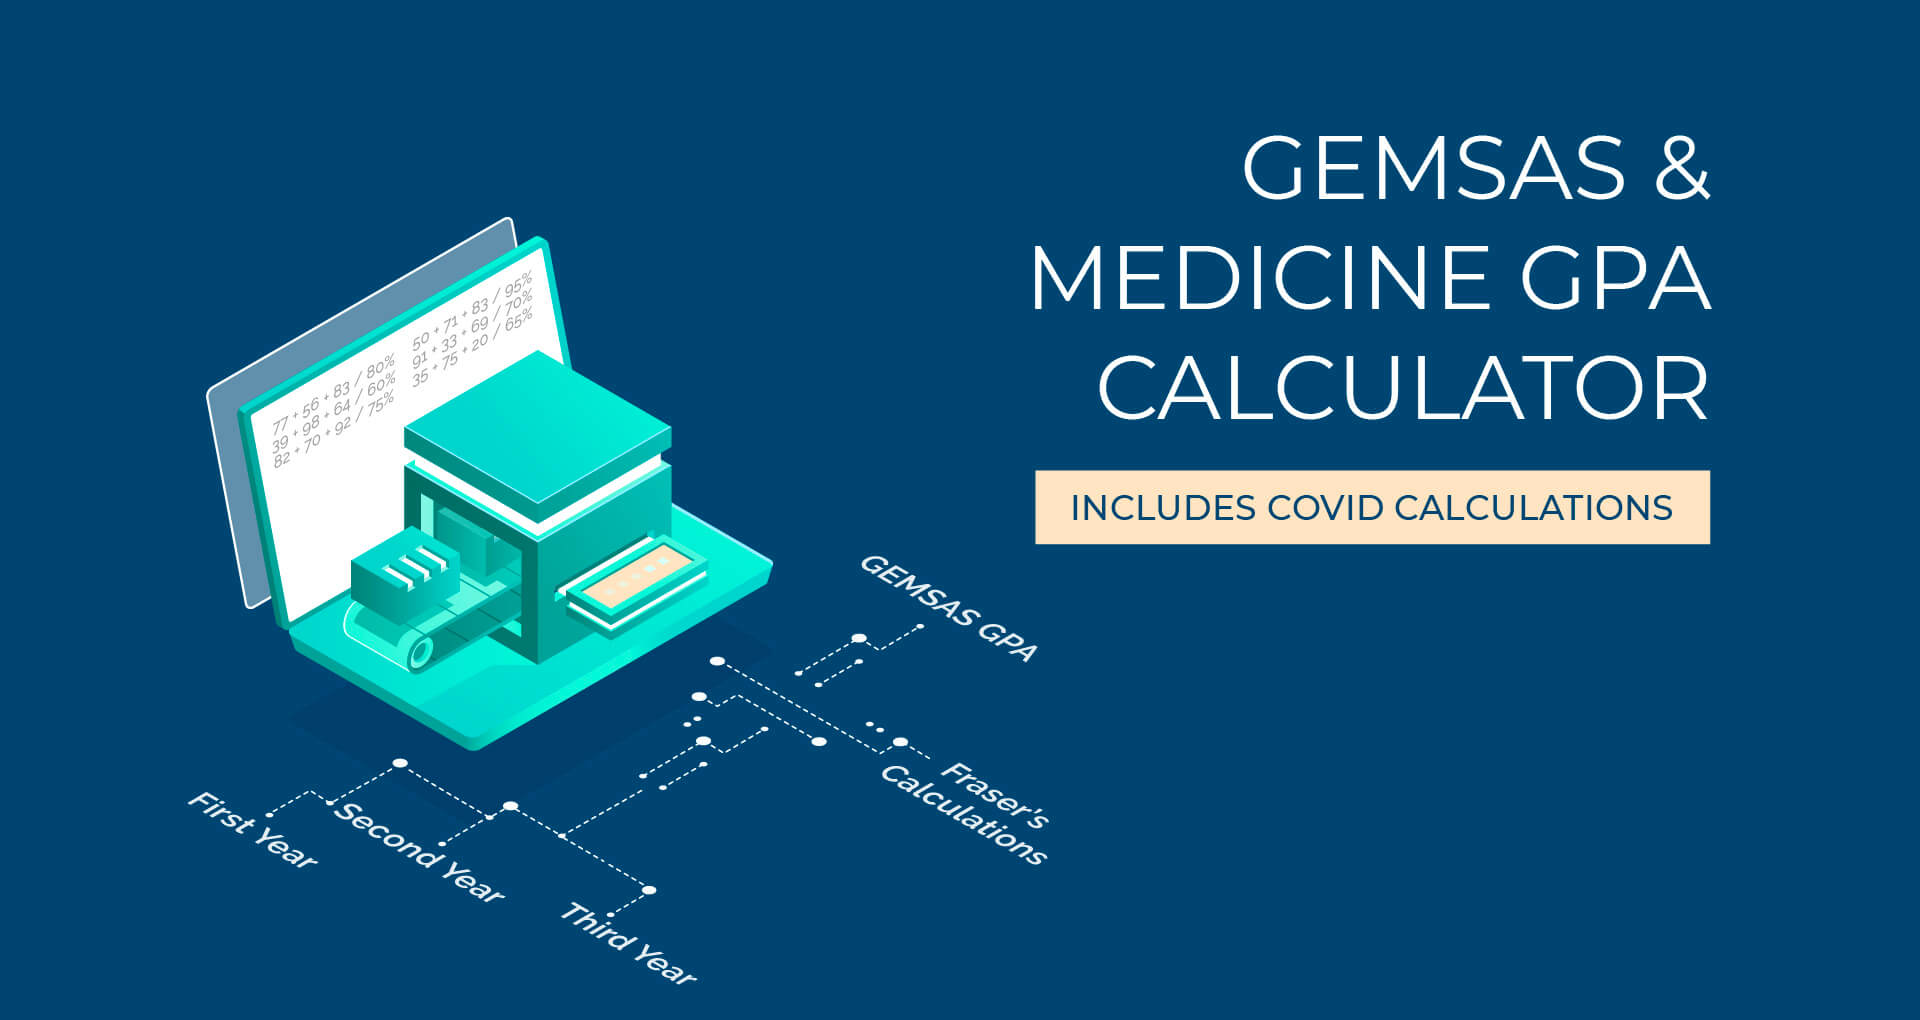 GAMSAT and GEMSAS GPA calculator